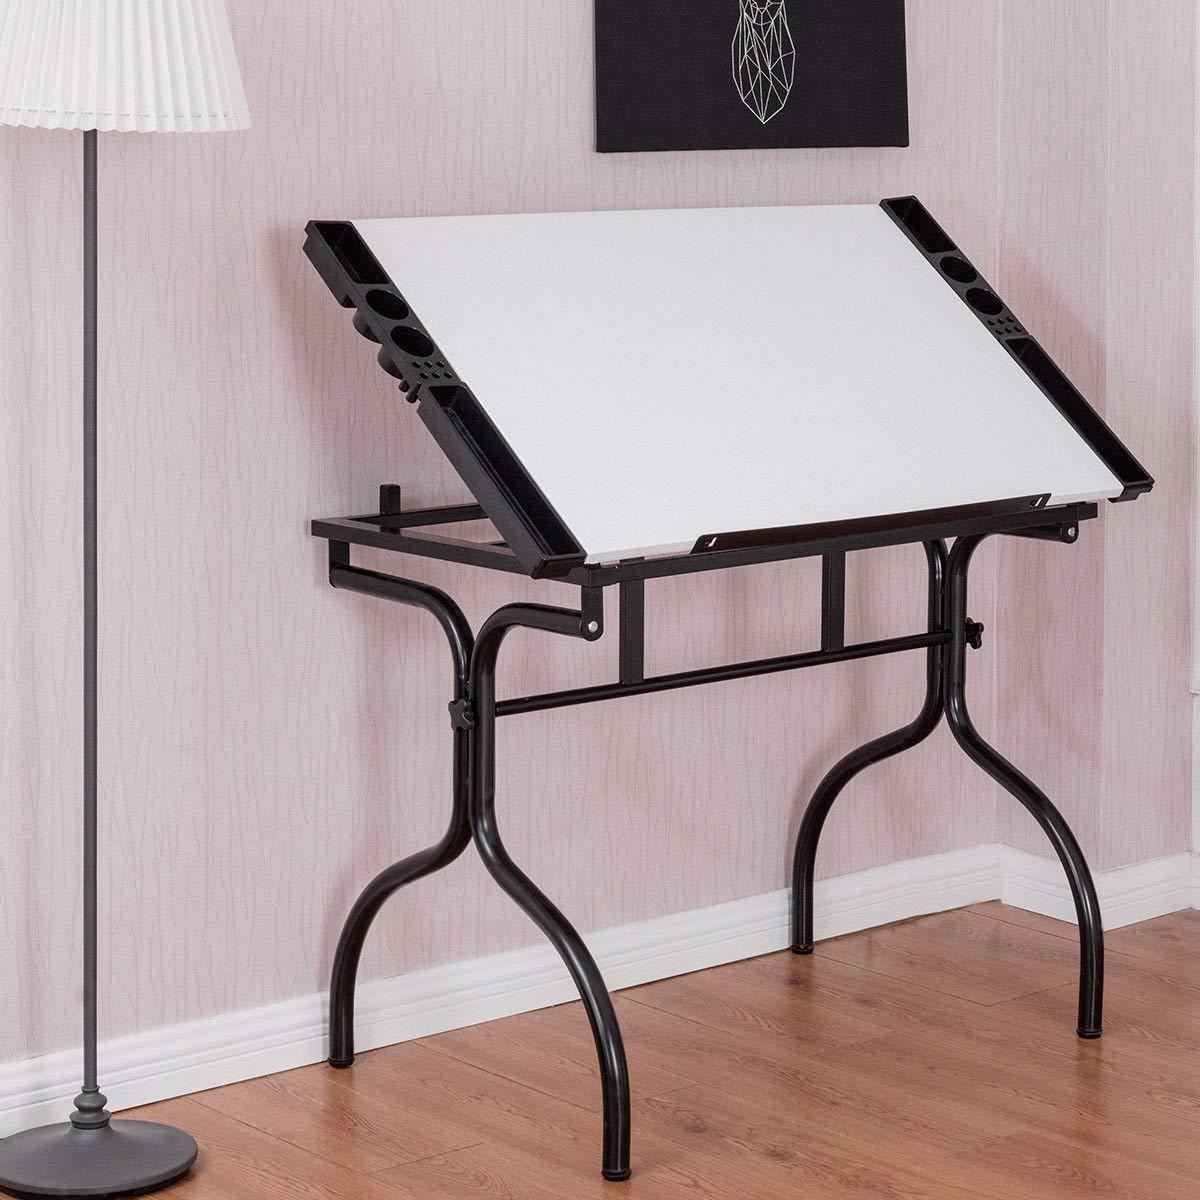 Tangkula Adjustable Drafting Table Folding Hobby Studio Art & Craft Station Drawing Desk